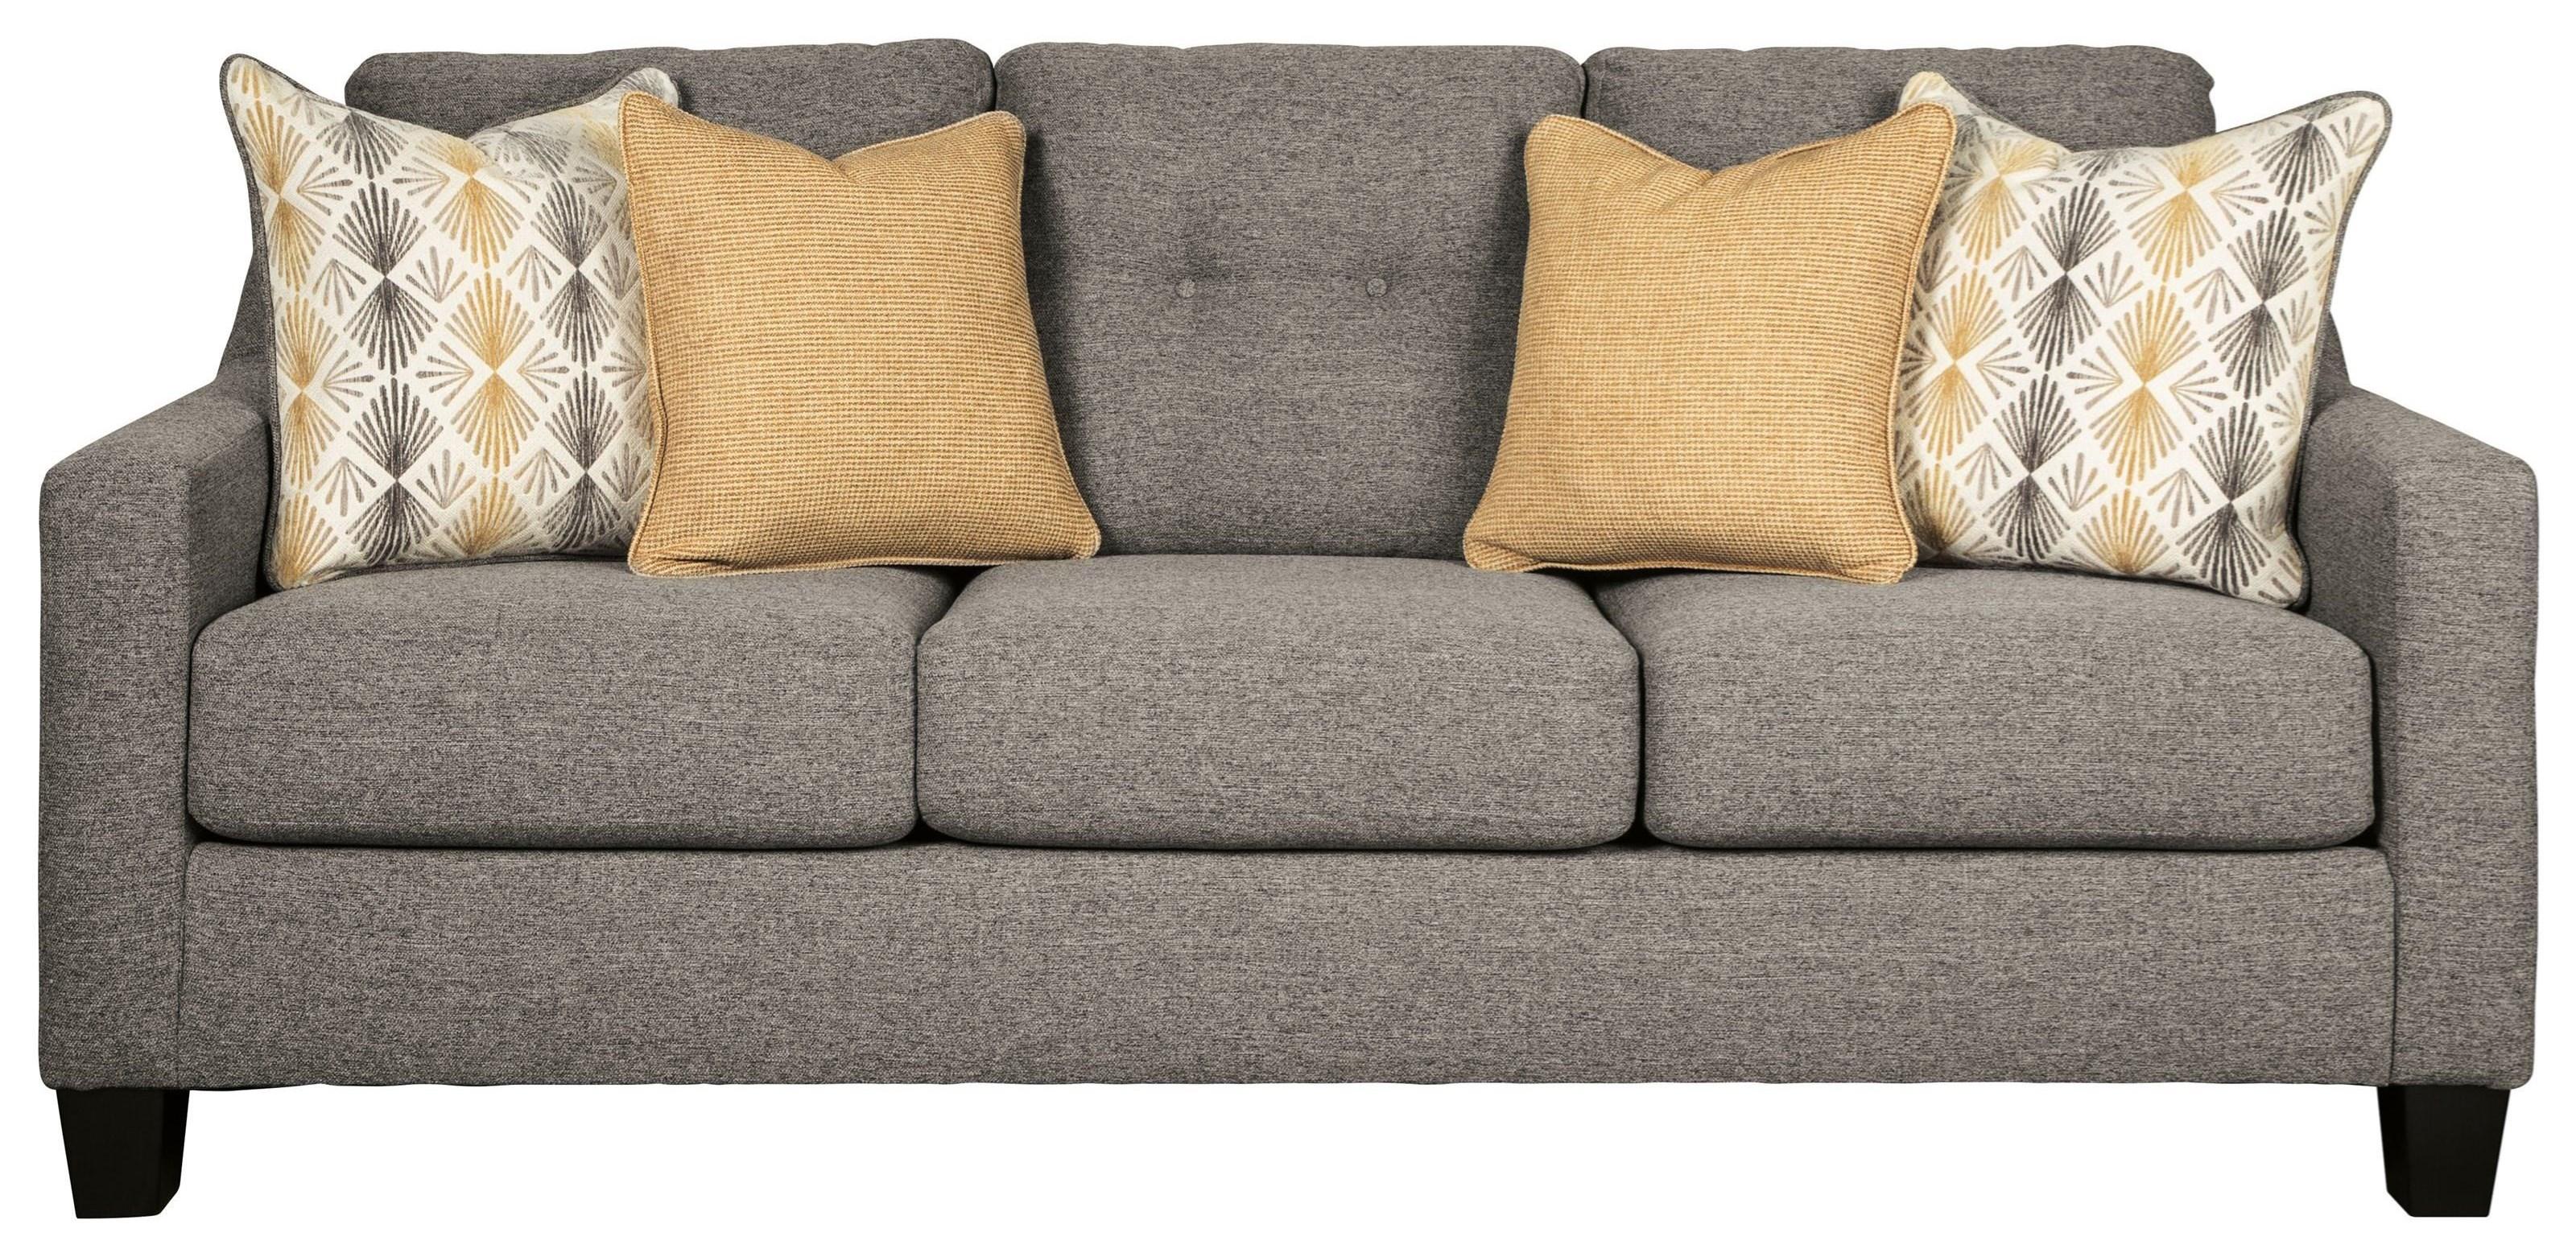 Sofa at Sadler's Home Furnishings